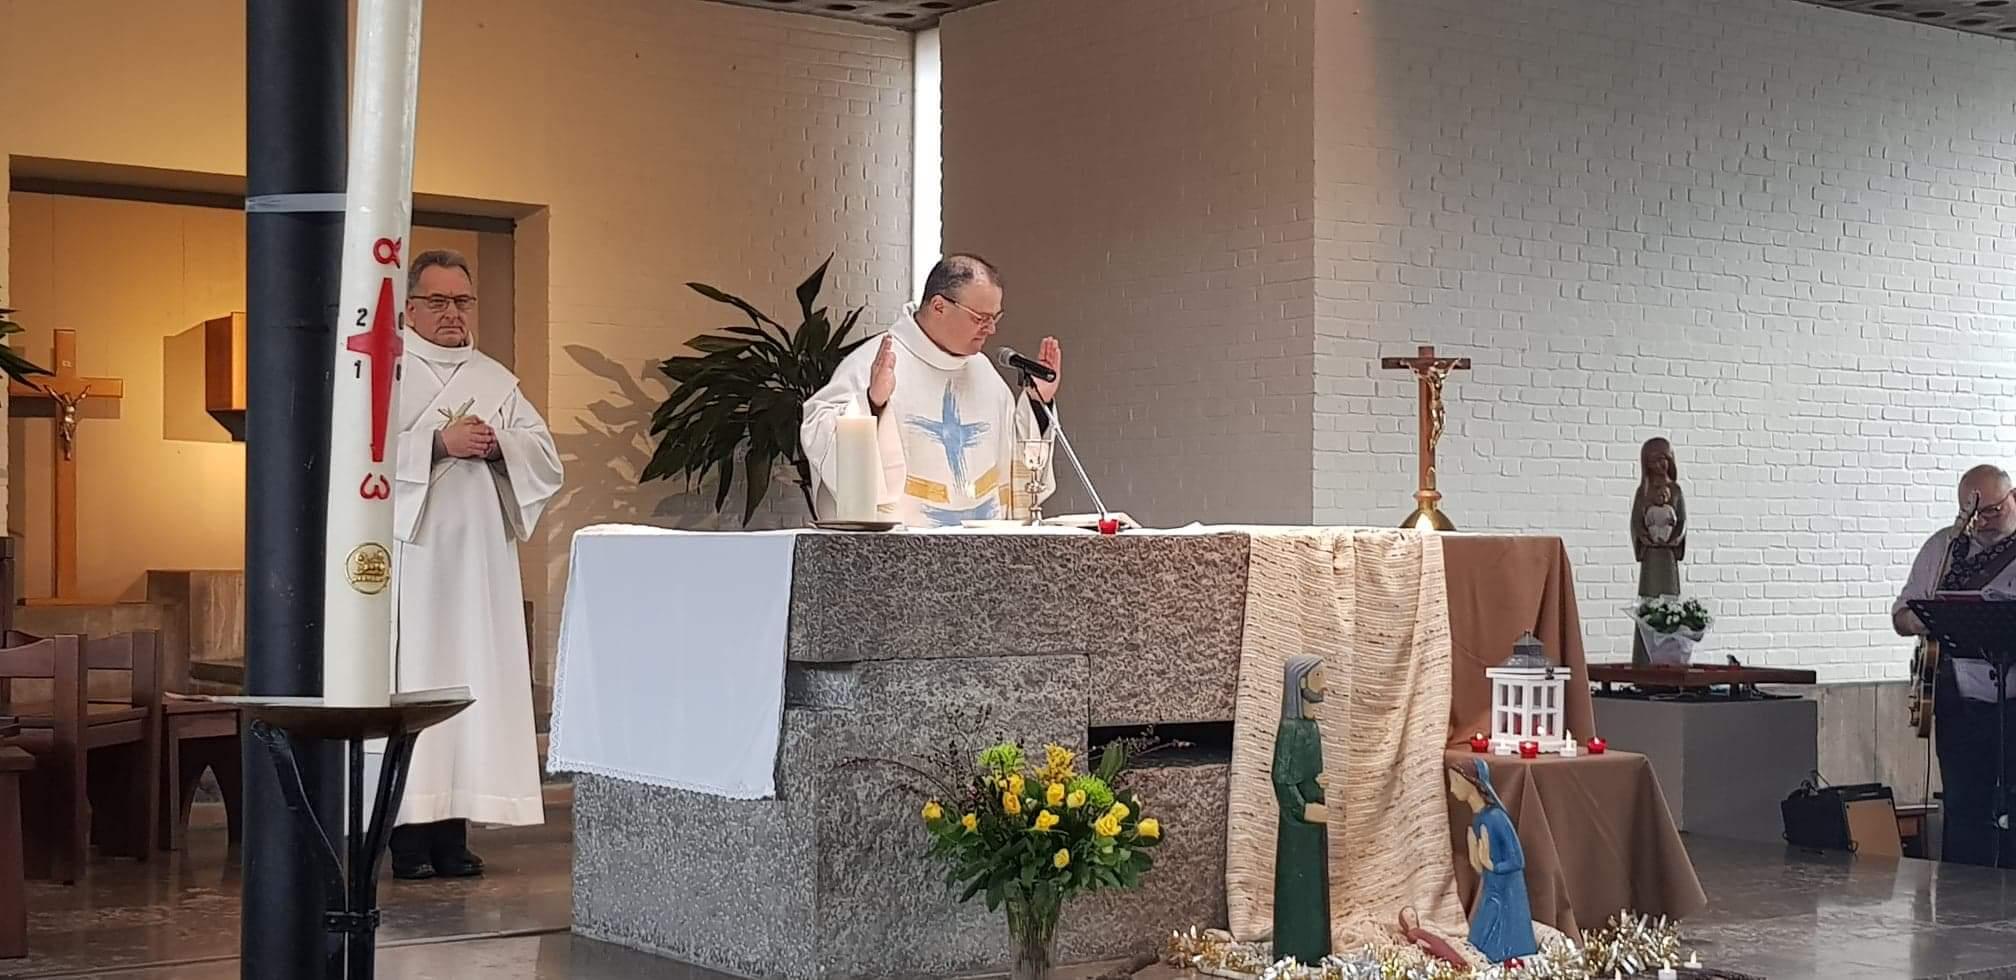 Messe familles St Roch 2019-01-13 (5)